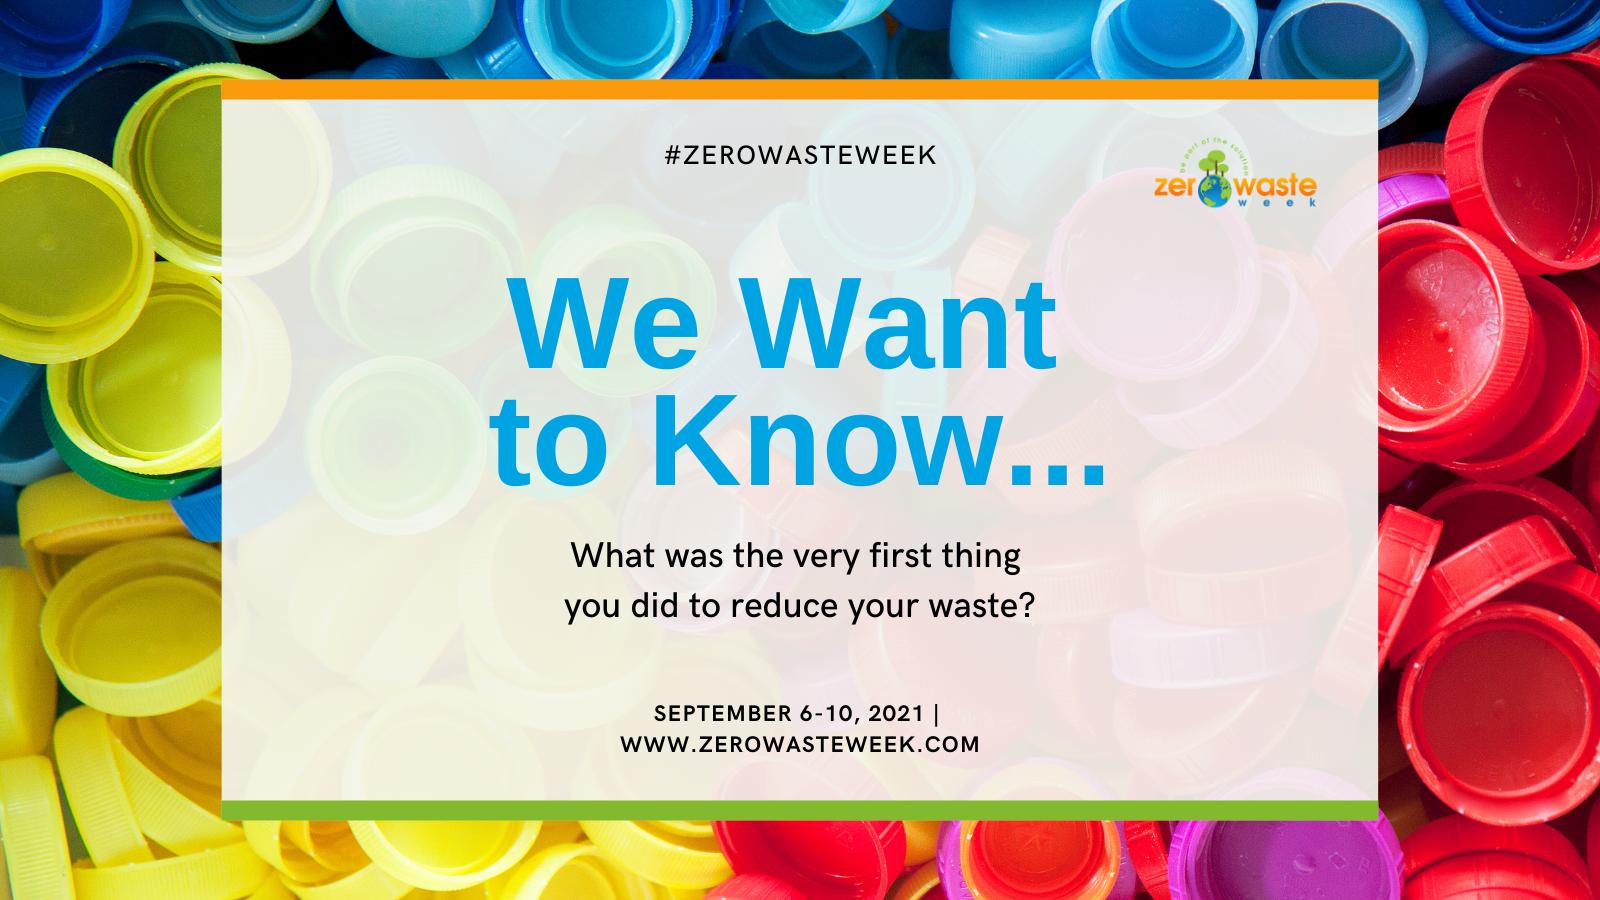 zero waste week day one question